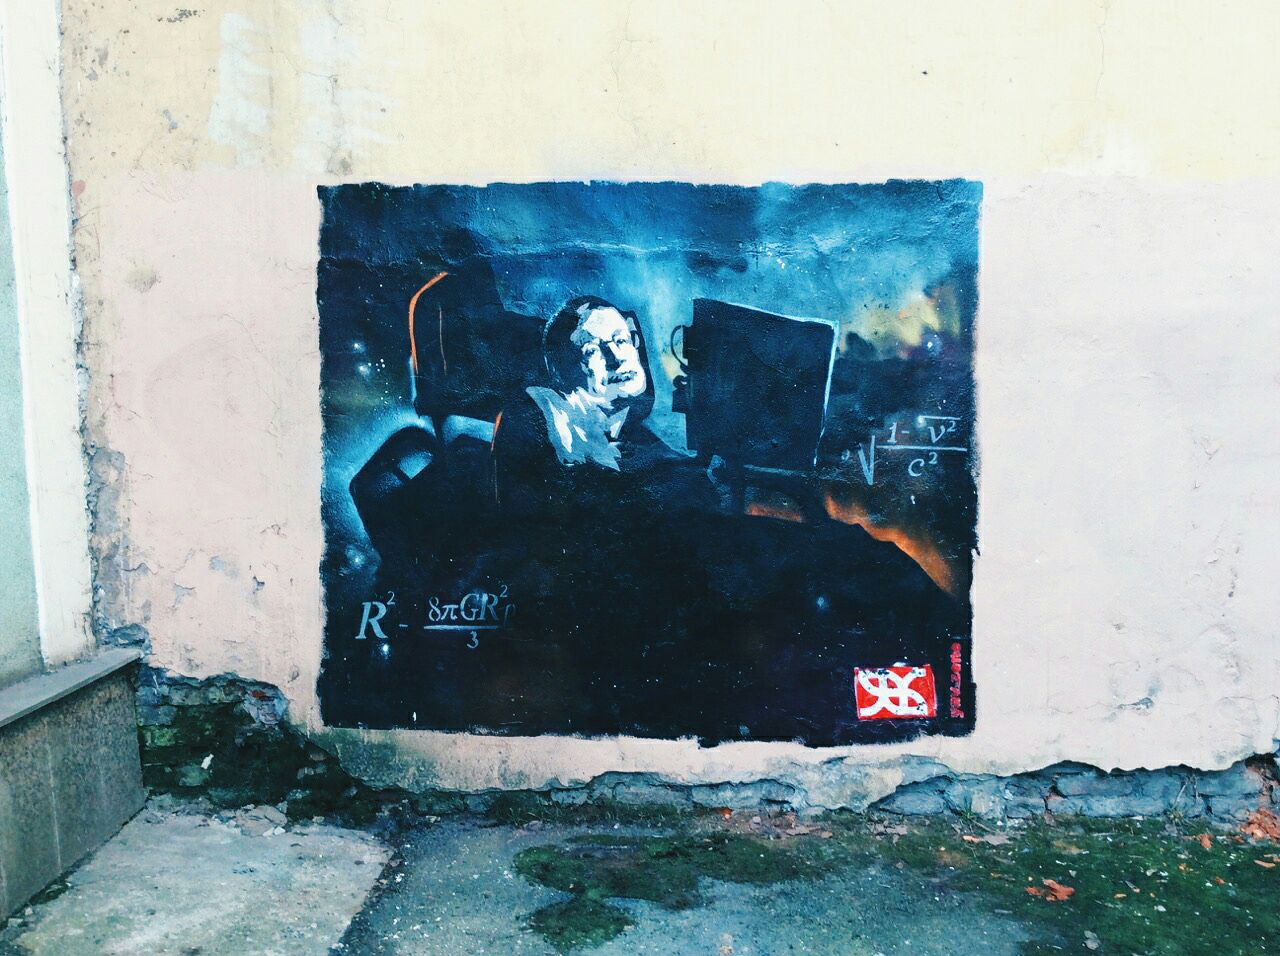 В Петербурге ко Дню космонавтики нарисовали граффити со Стивеном Хокингом (2 фото)